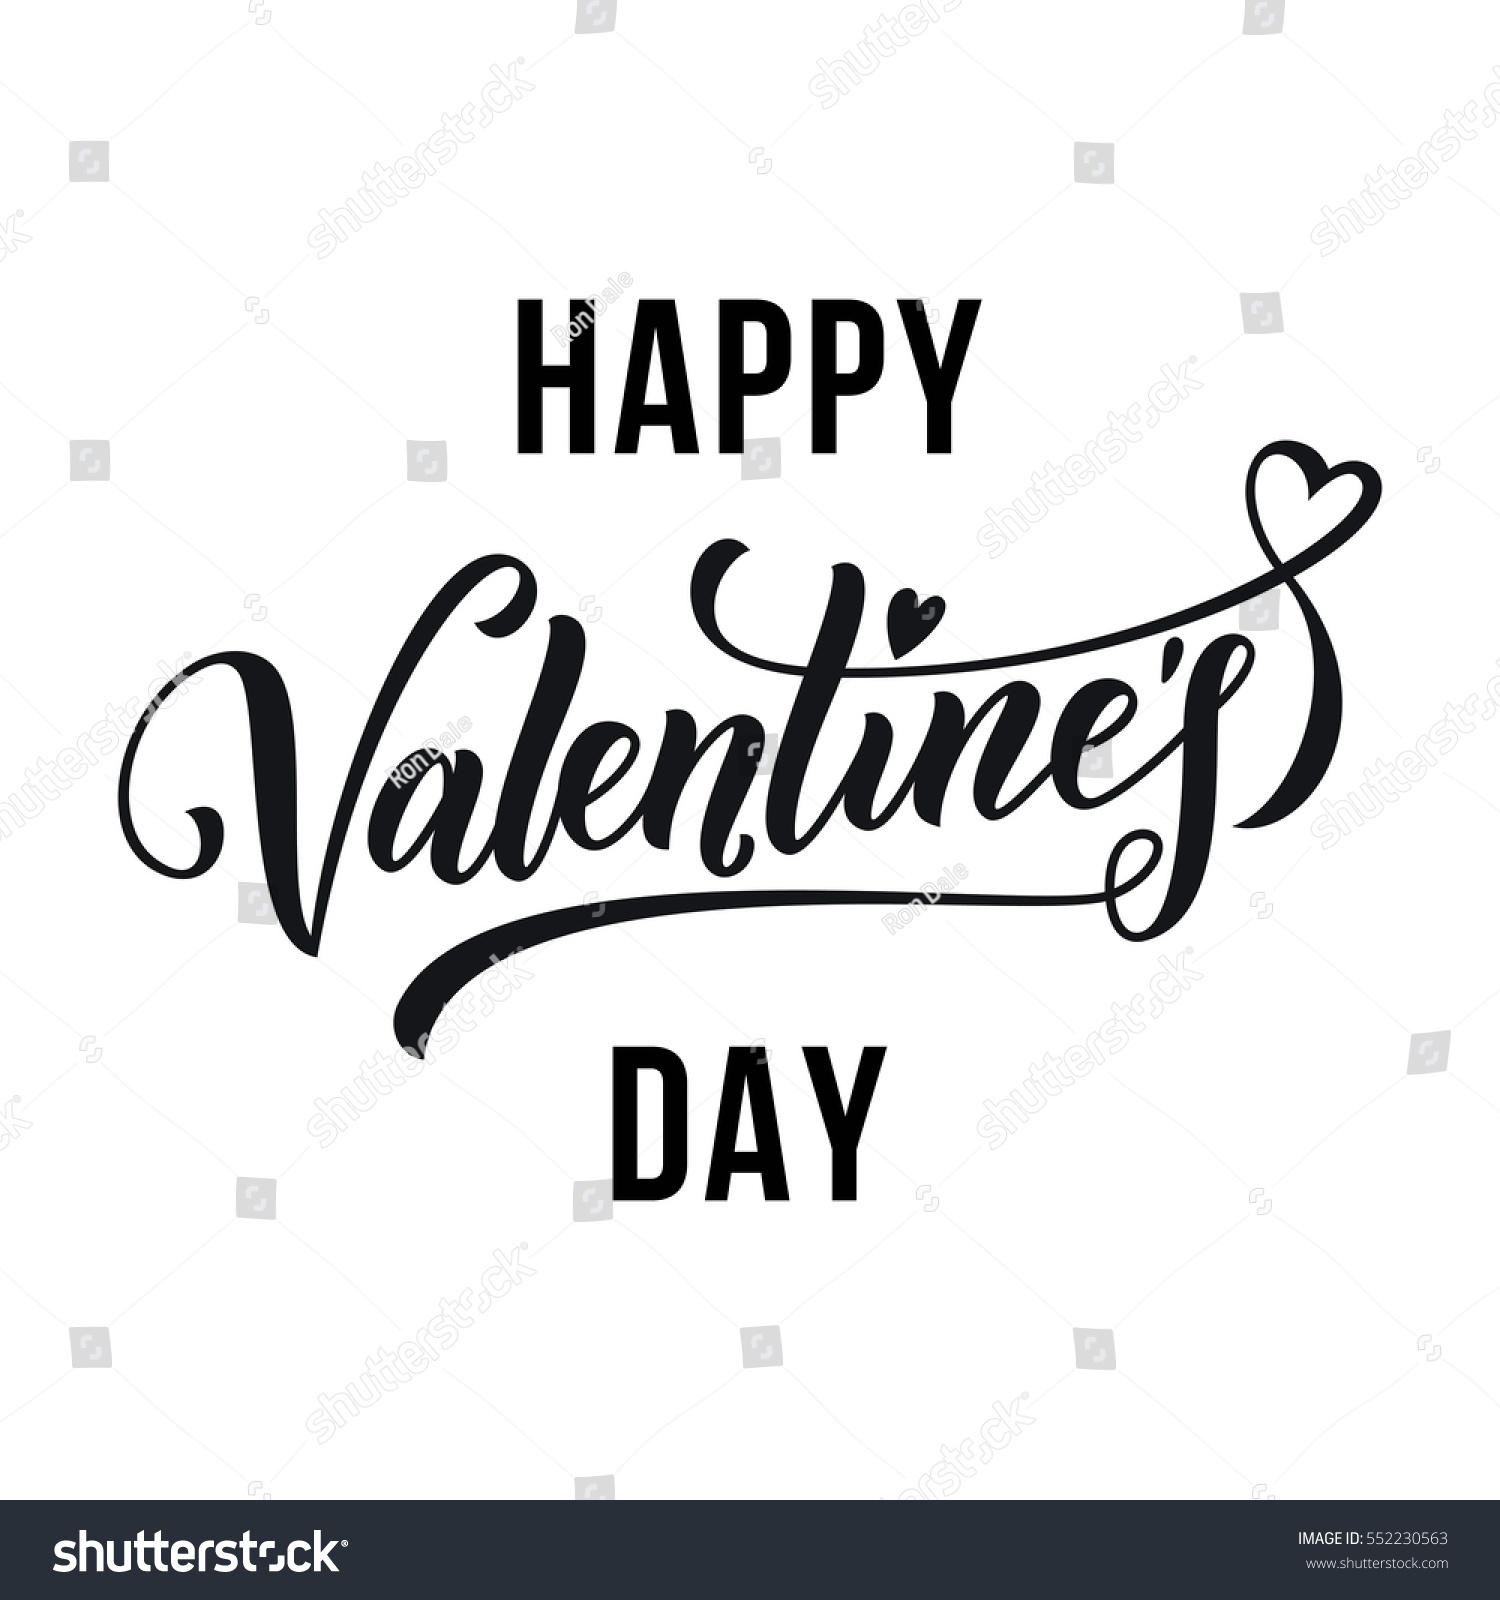 Saint valentine vector heart calligraphy text stock